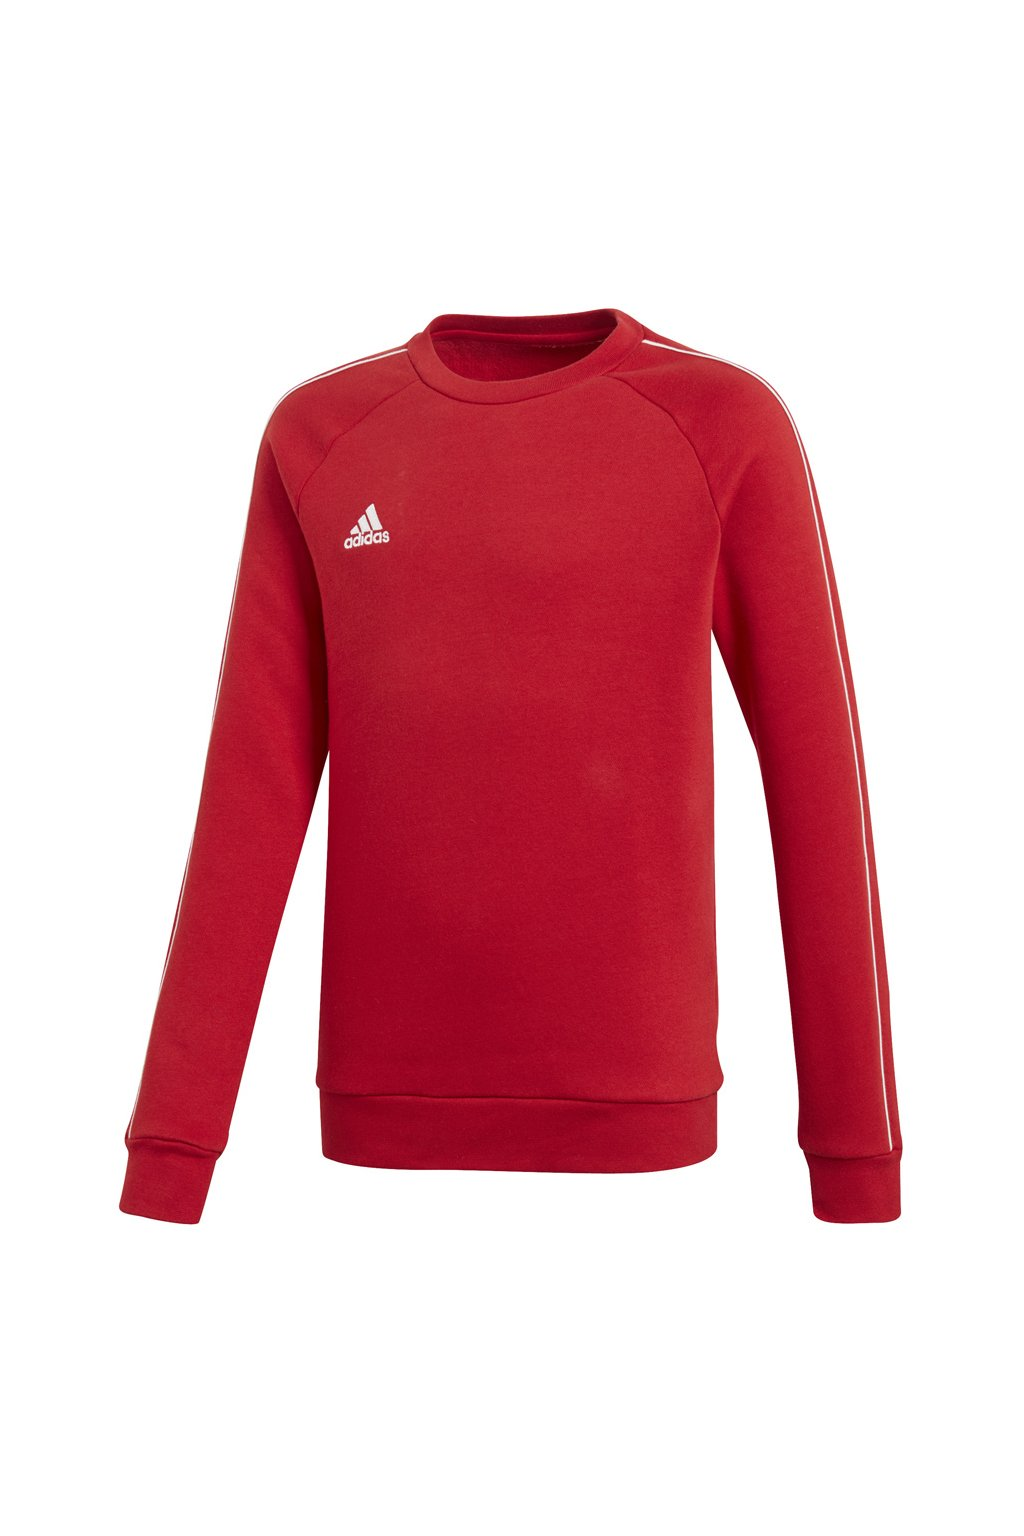 Detská mikina Adidas Core 18 Sweat Top JUNIOR červená CV3970